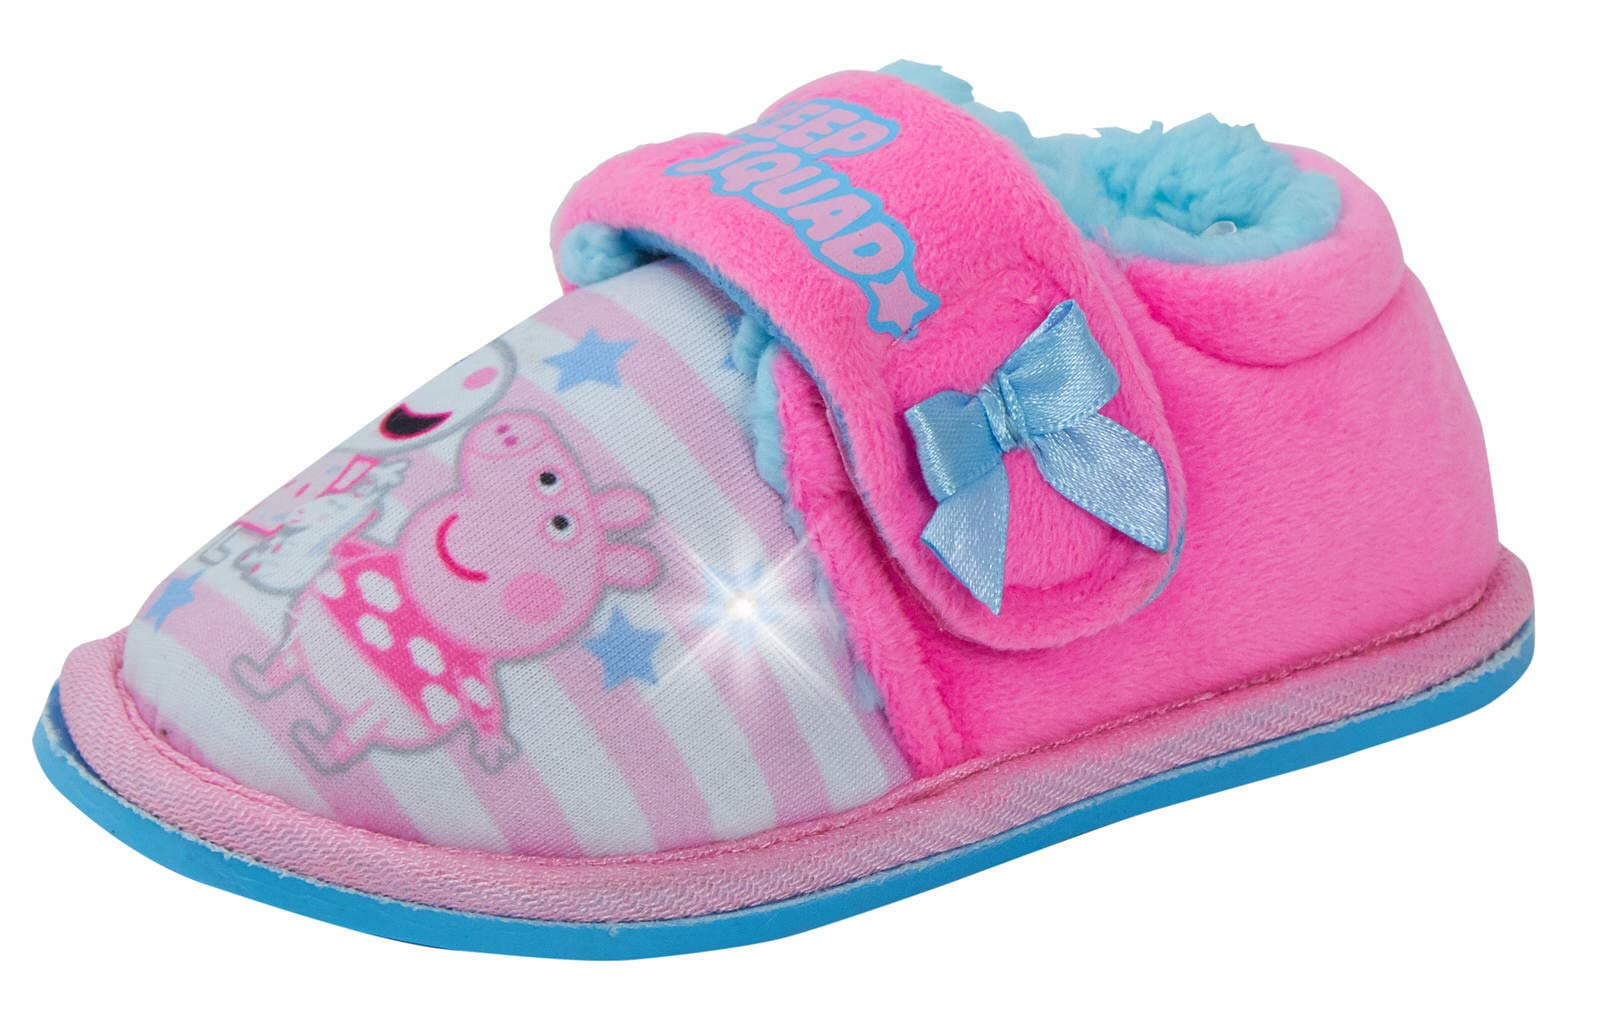 Peppa Pig Girls Light Up Slippers Kids